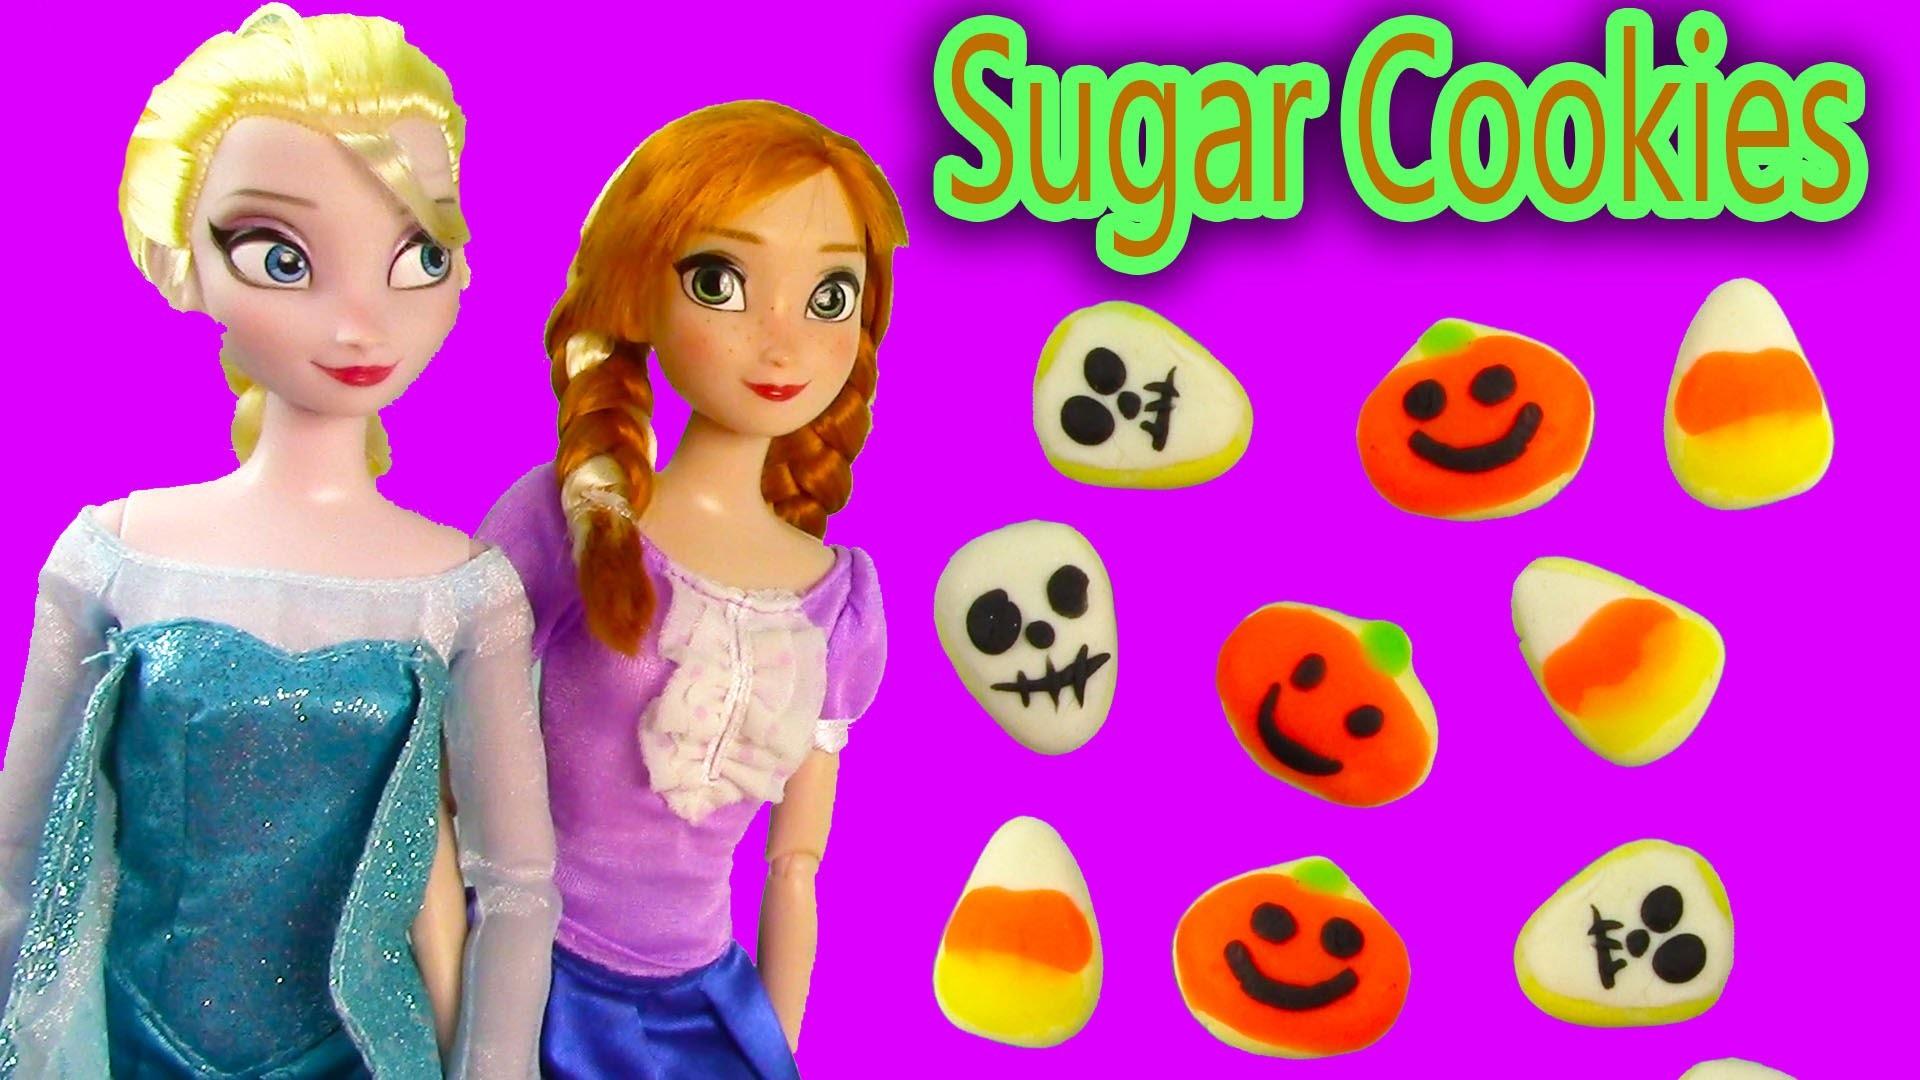 Disney Frozen Play-doh Halloween Sugar Cookies Queen Elsa Princess Anna Doll Food Craft